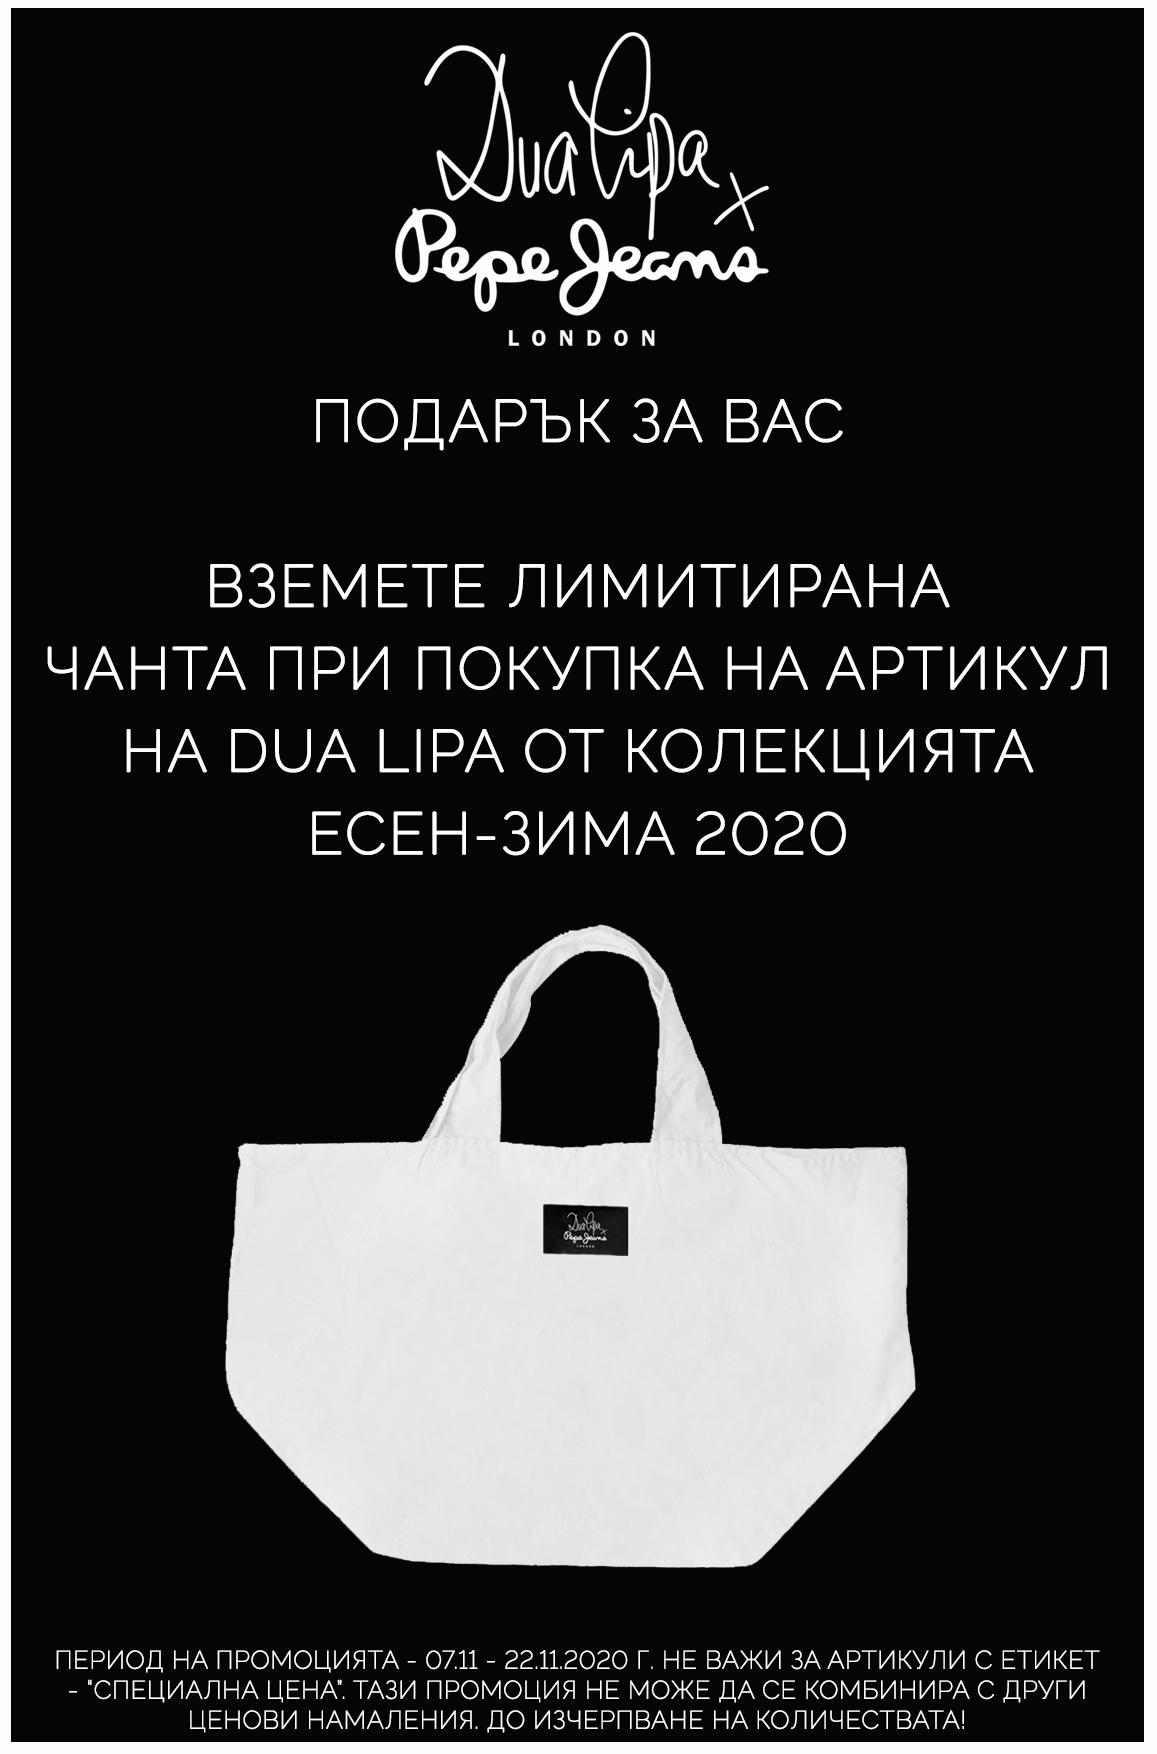 Dua LipaиPepe Jeansза сезонЕсен-Зима 2020